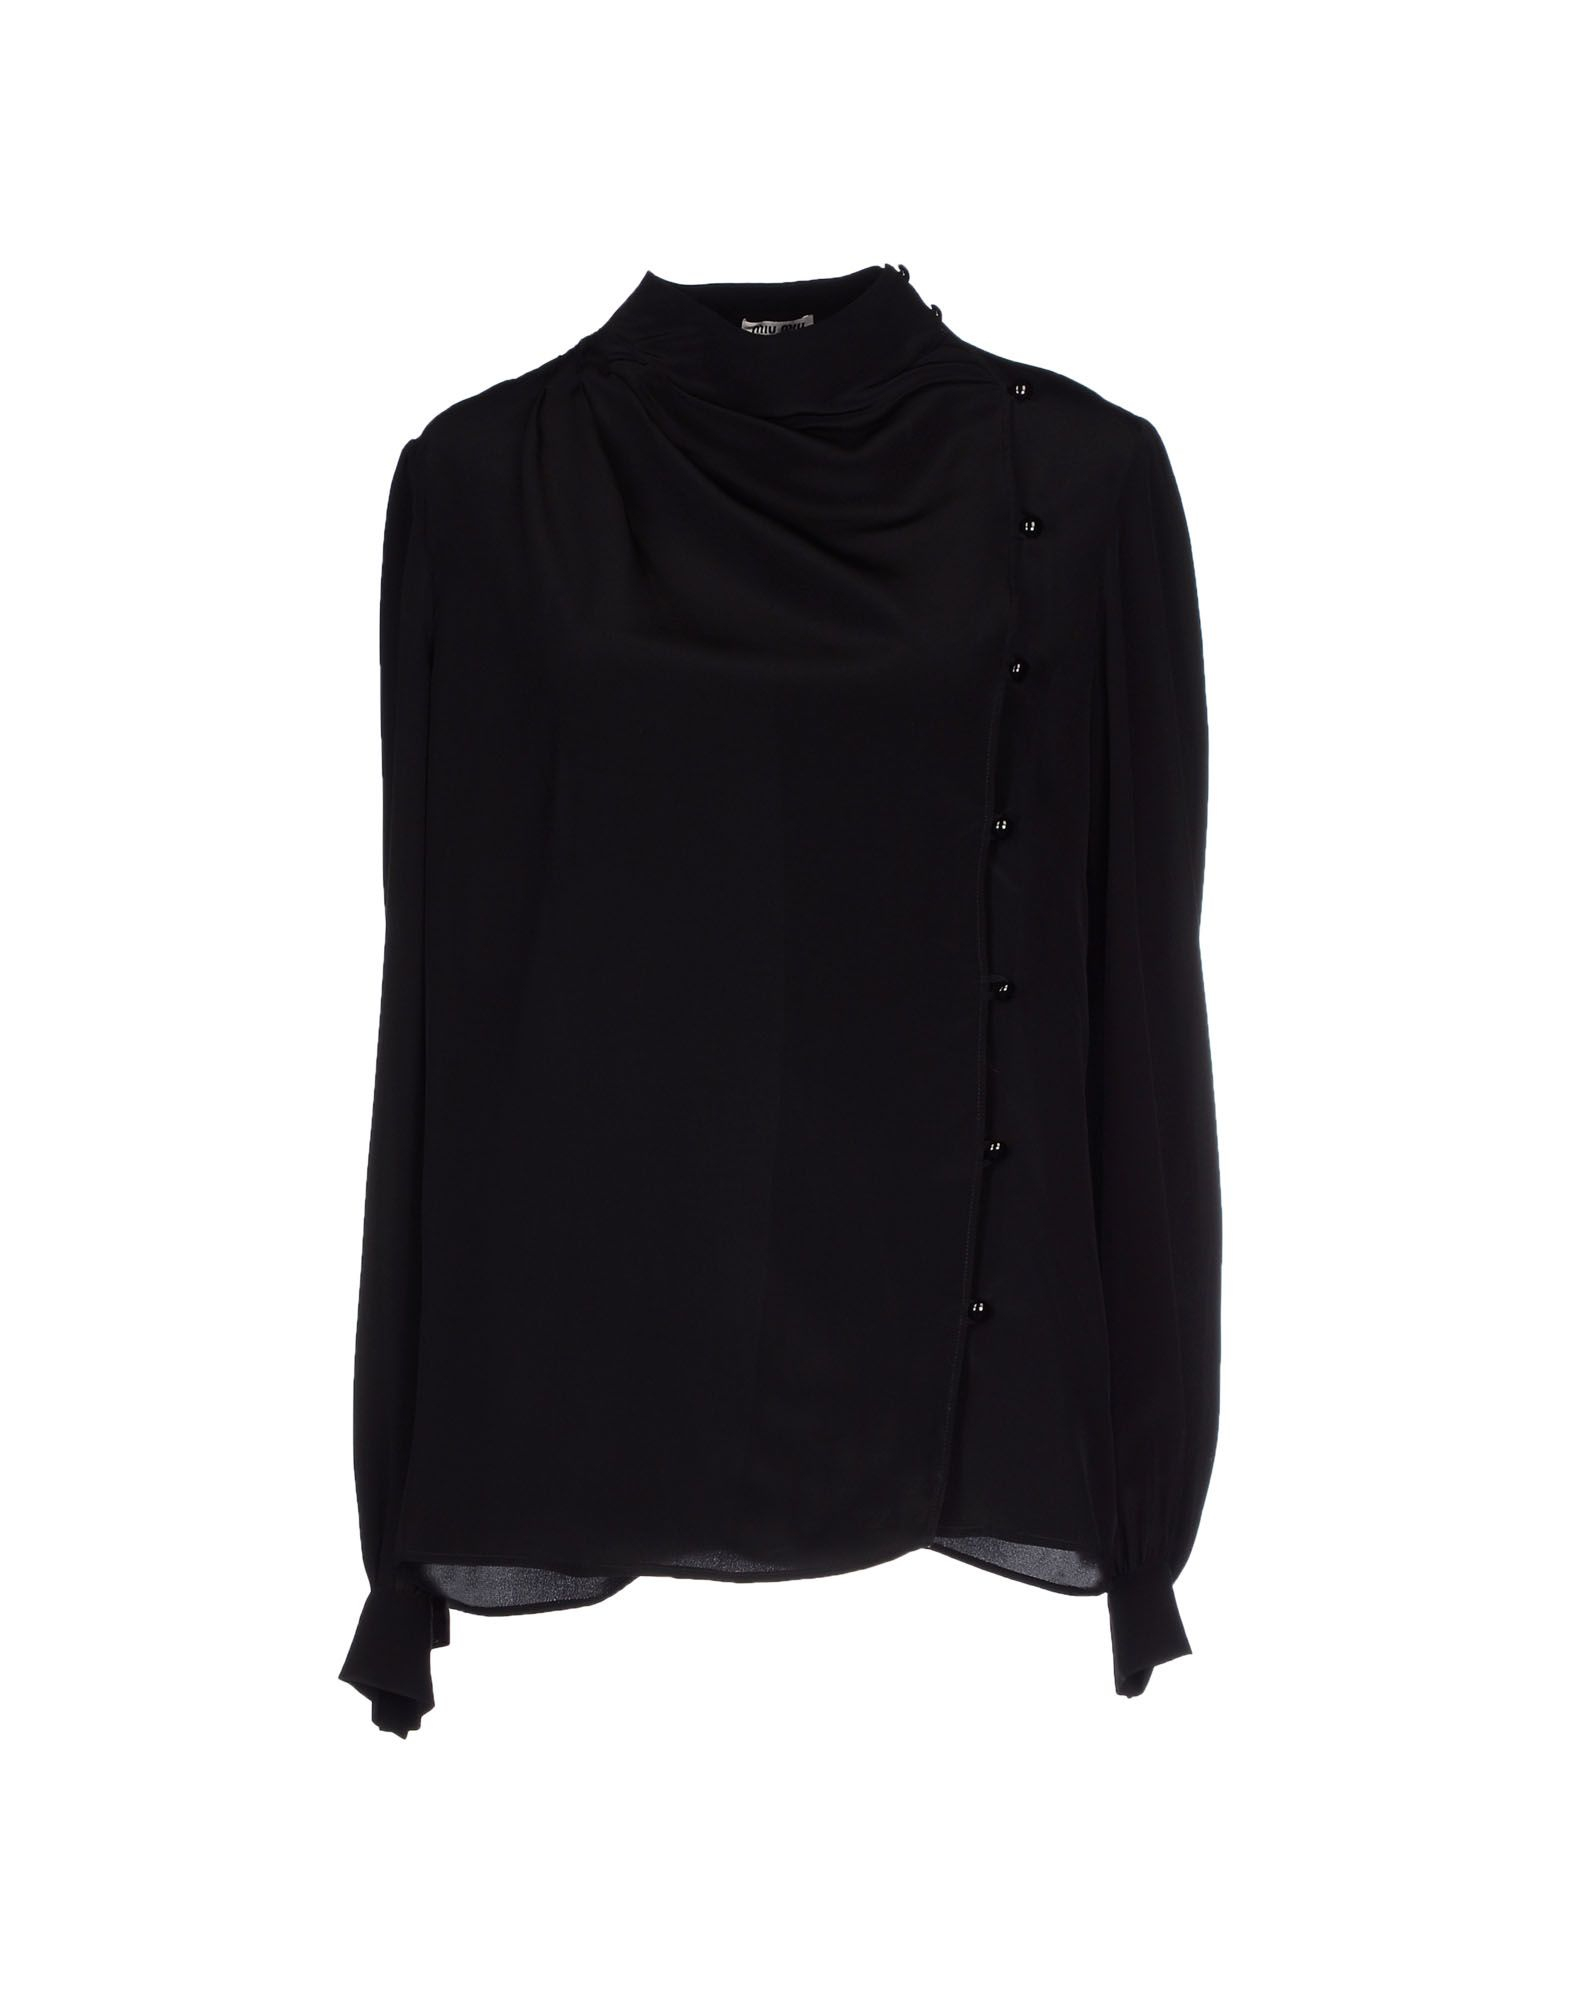 Miu miu shirt in black lyst for Miu miu t shirt